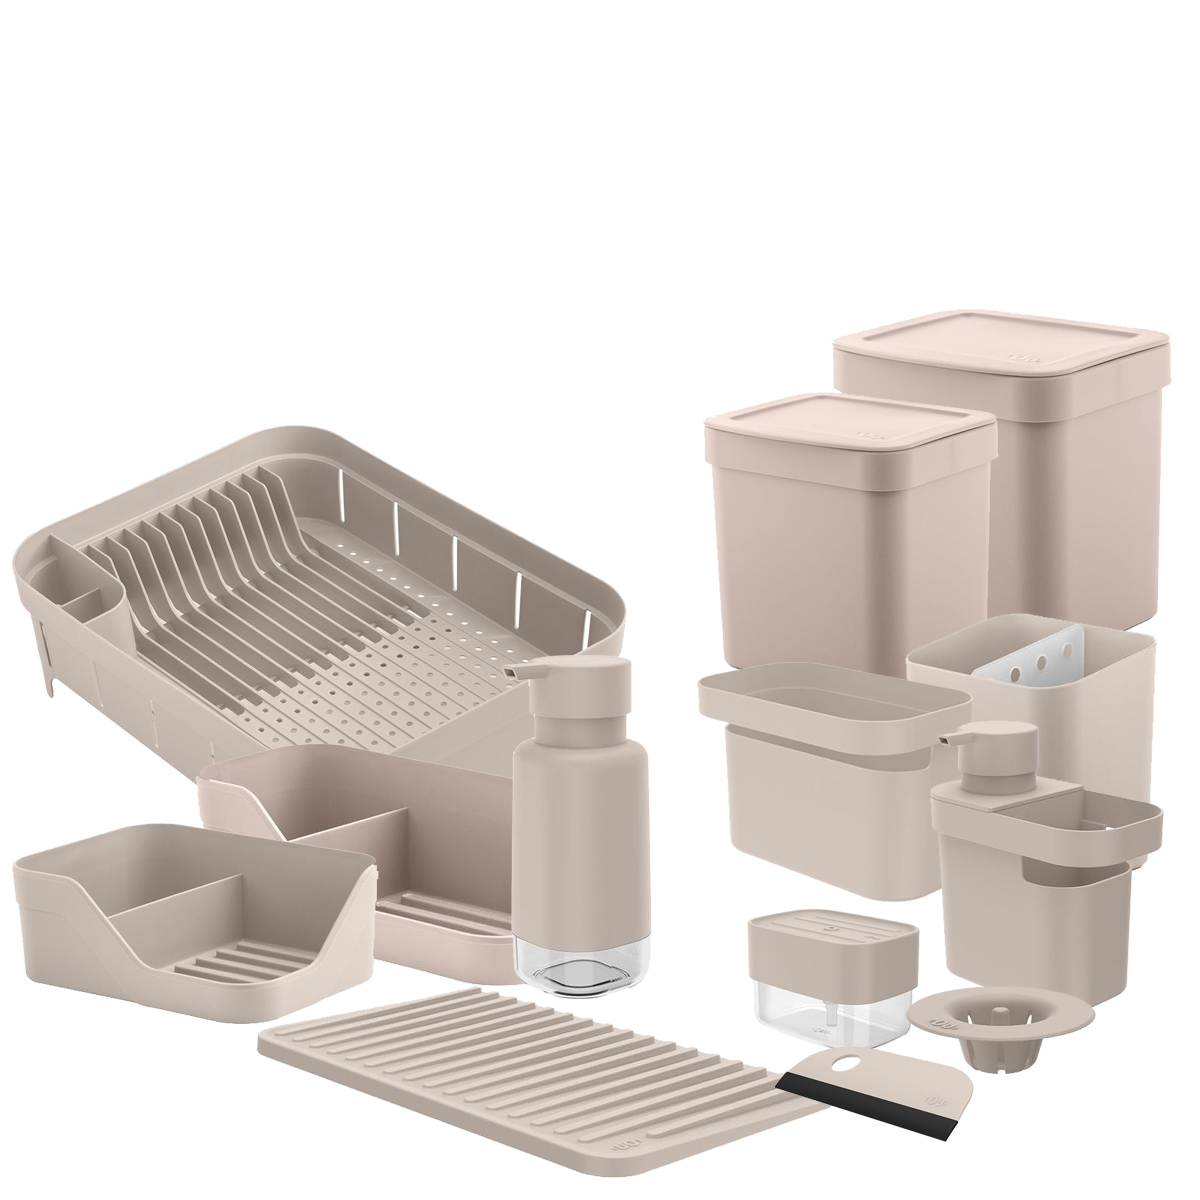 Kit para Pia 13pc Bege OU Organizador/Escorredor/Dispenser